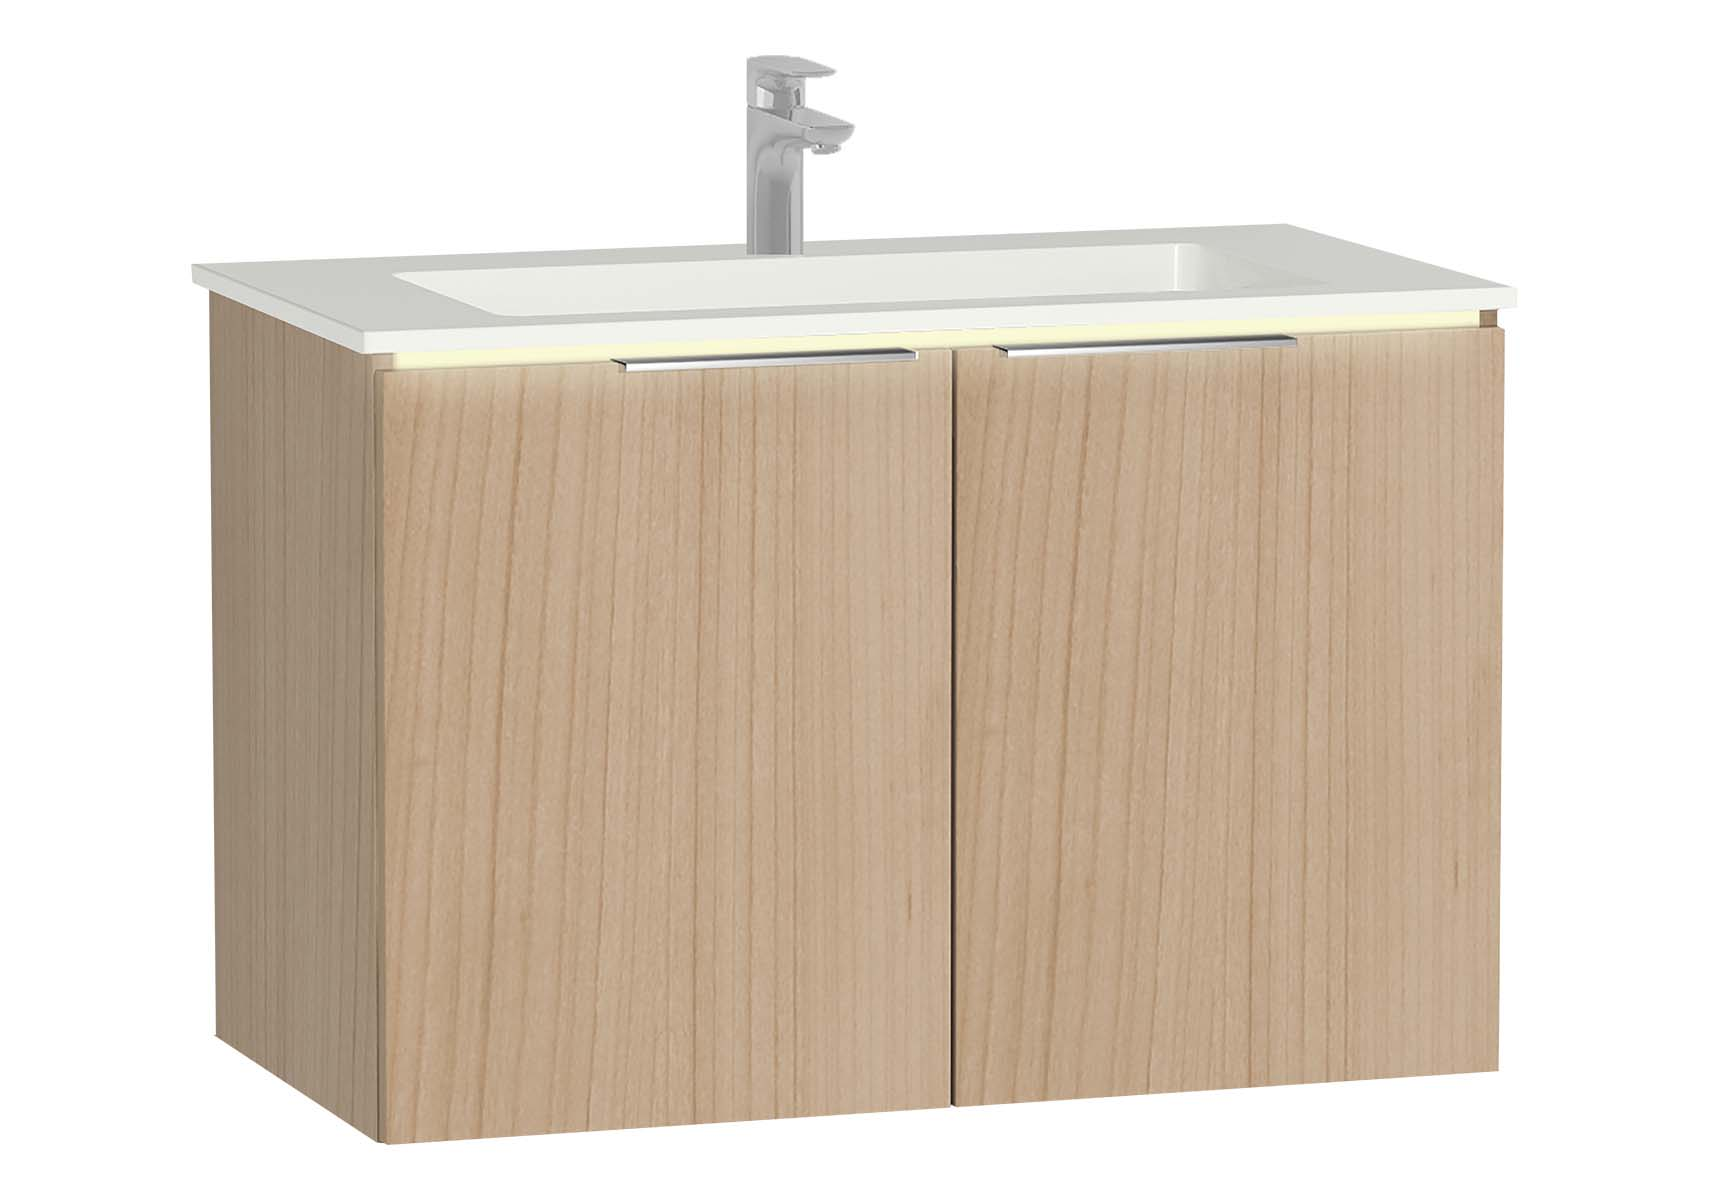 Central Washbasin Unit with doors, 90 cm, Golden Cherry, Infinit Washbasin, Led